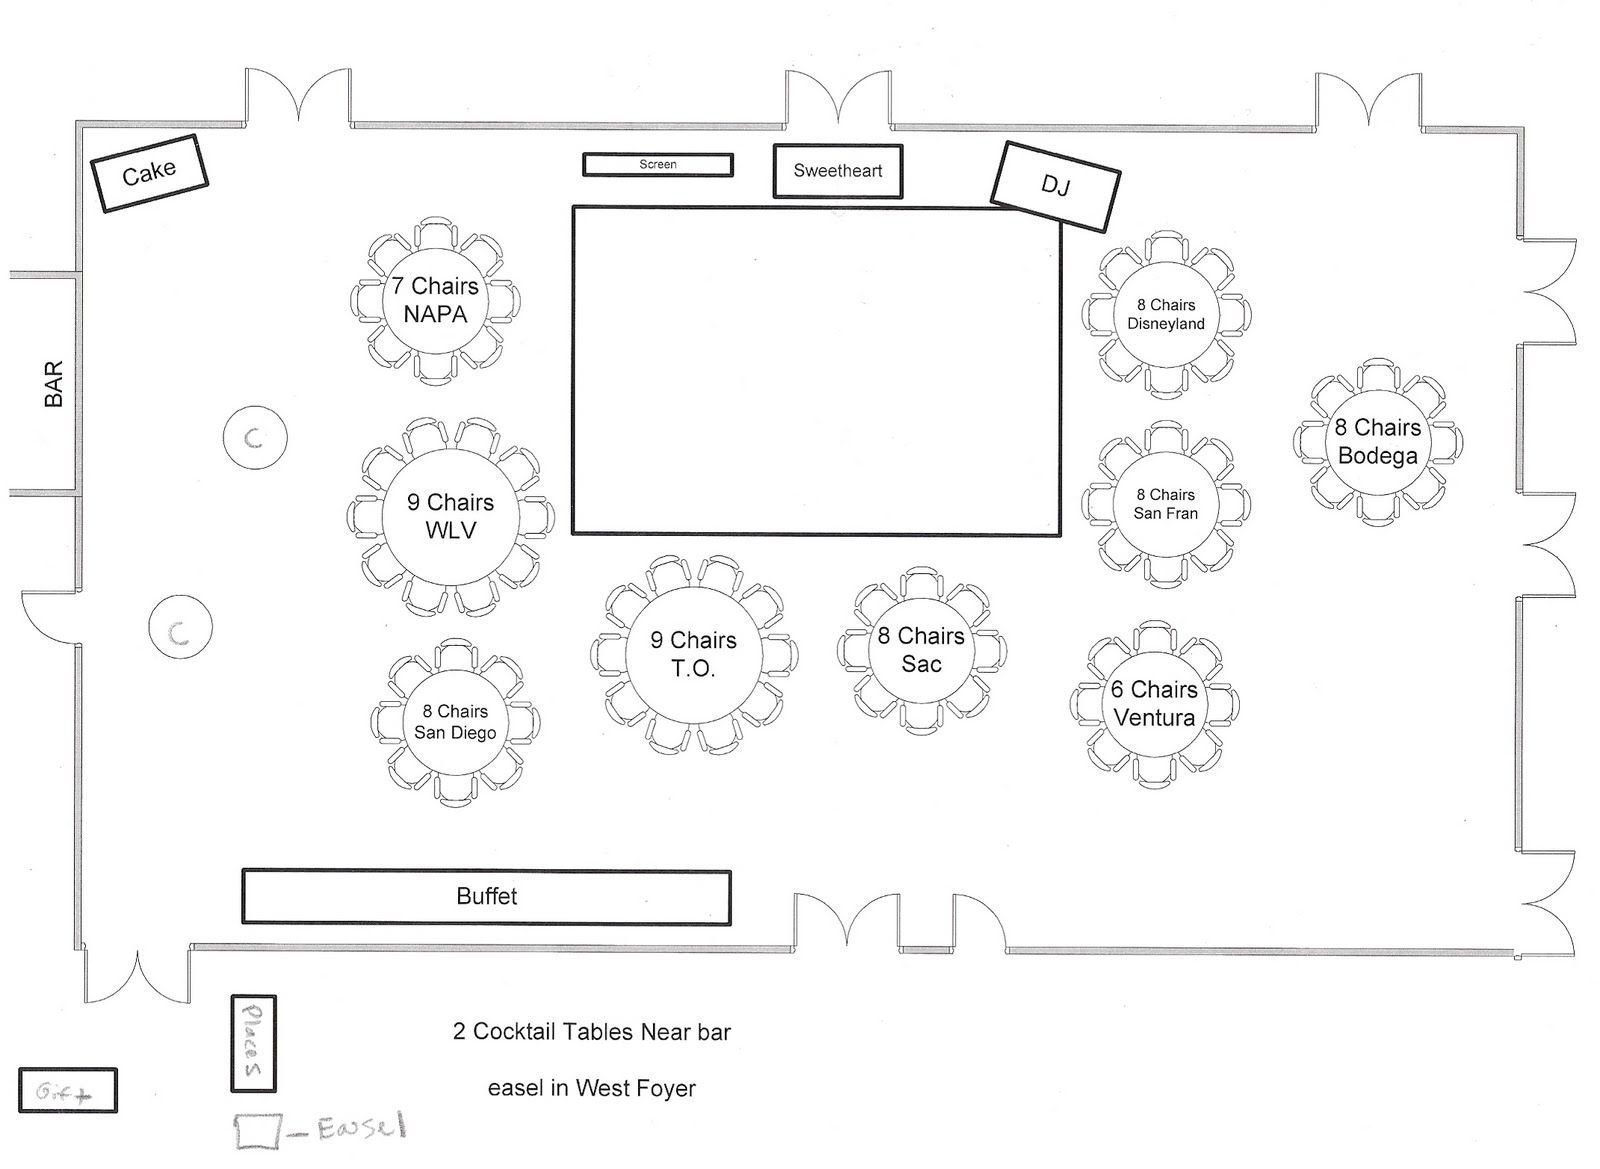 room setup diagram wiring for contactor and overload sample seating floor plan hawaiianweddings